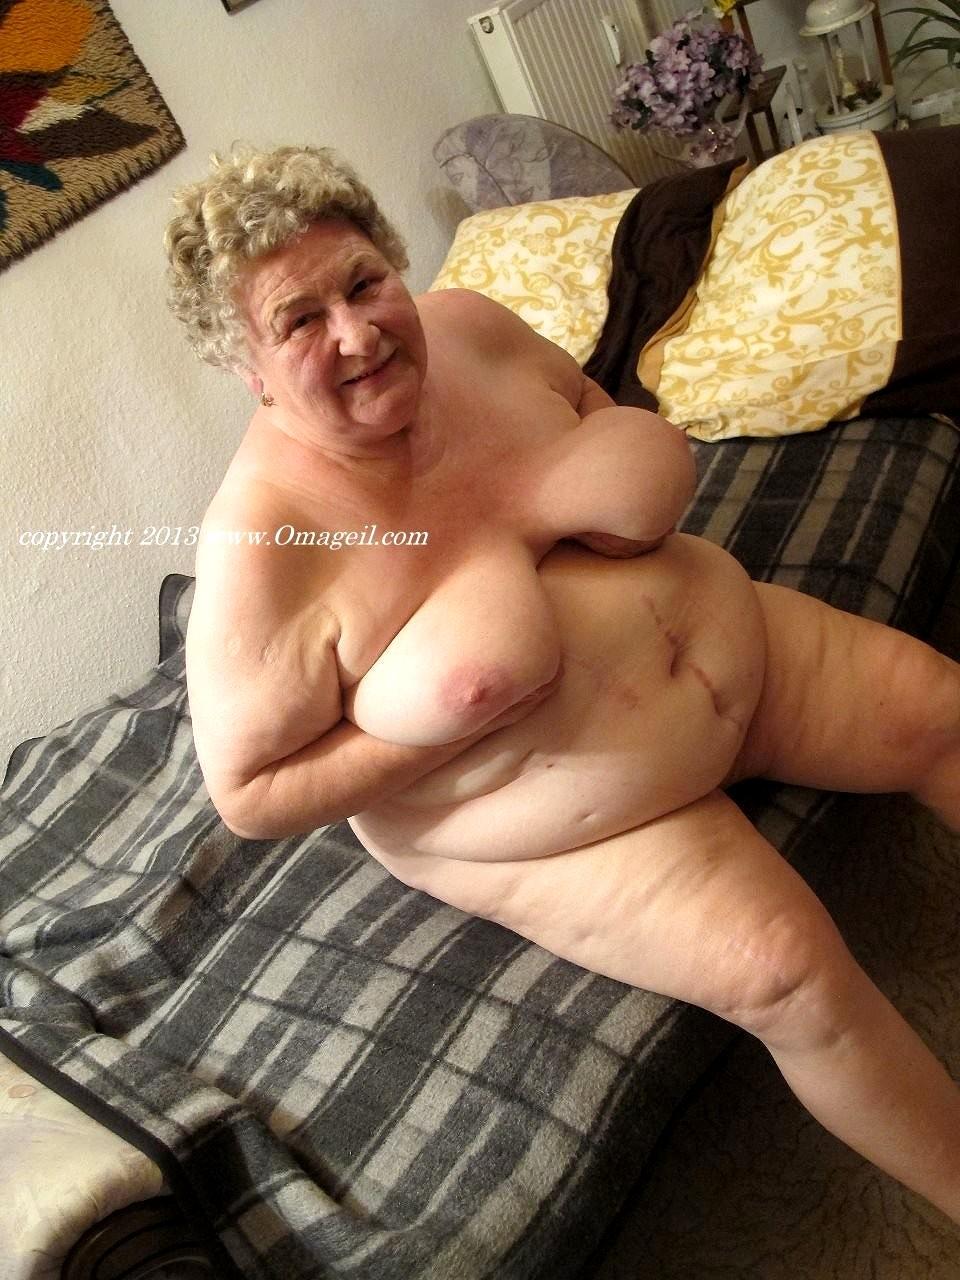 Hot nude bizarre girls